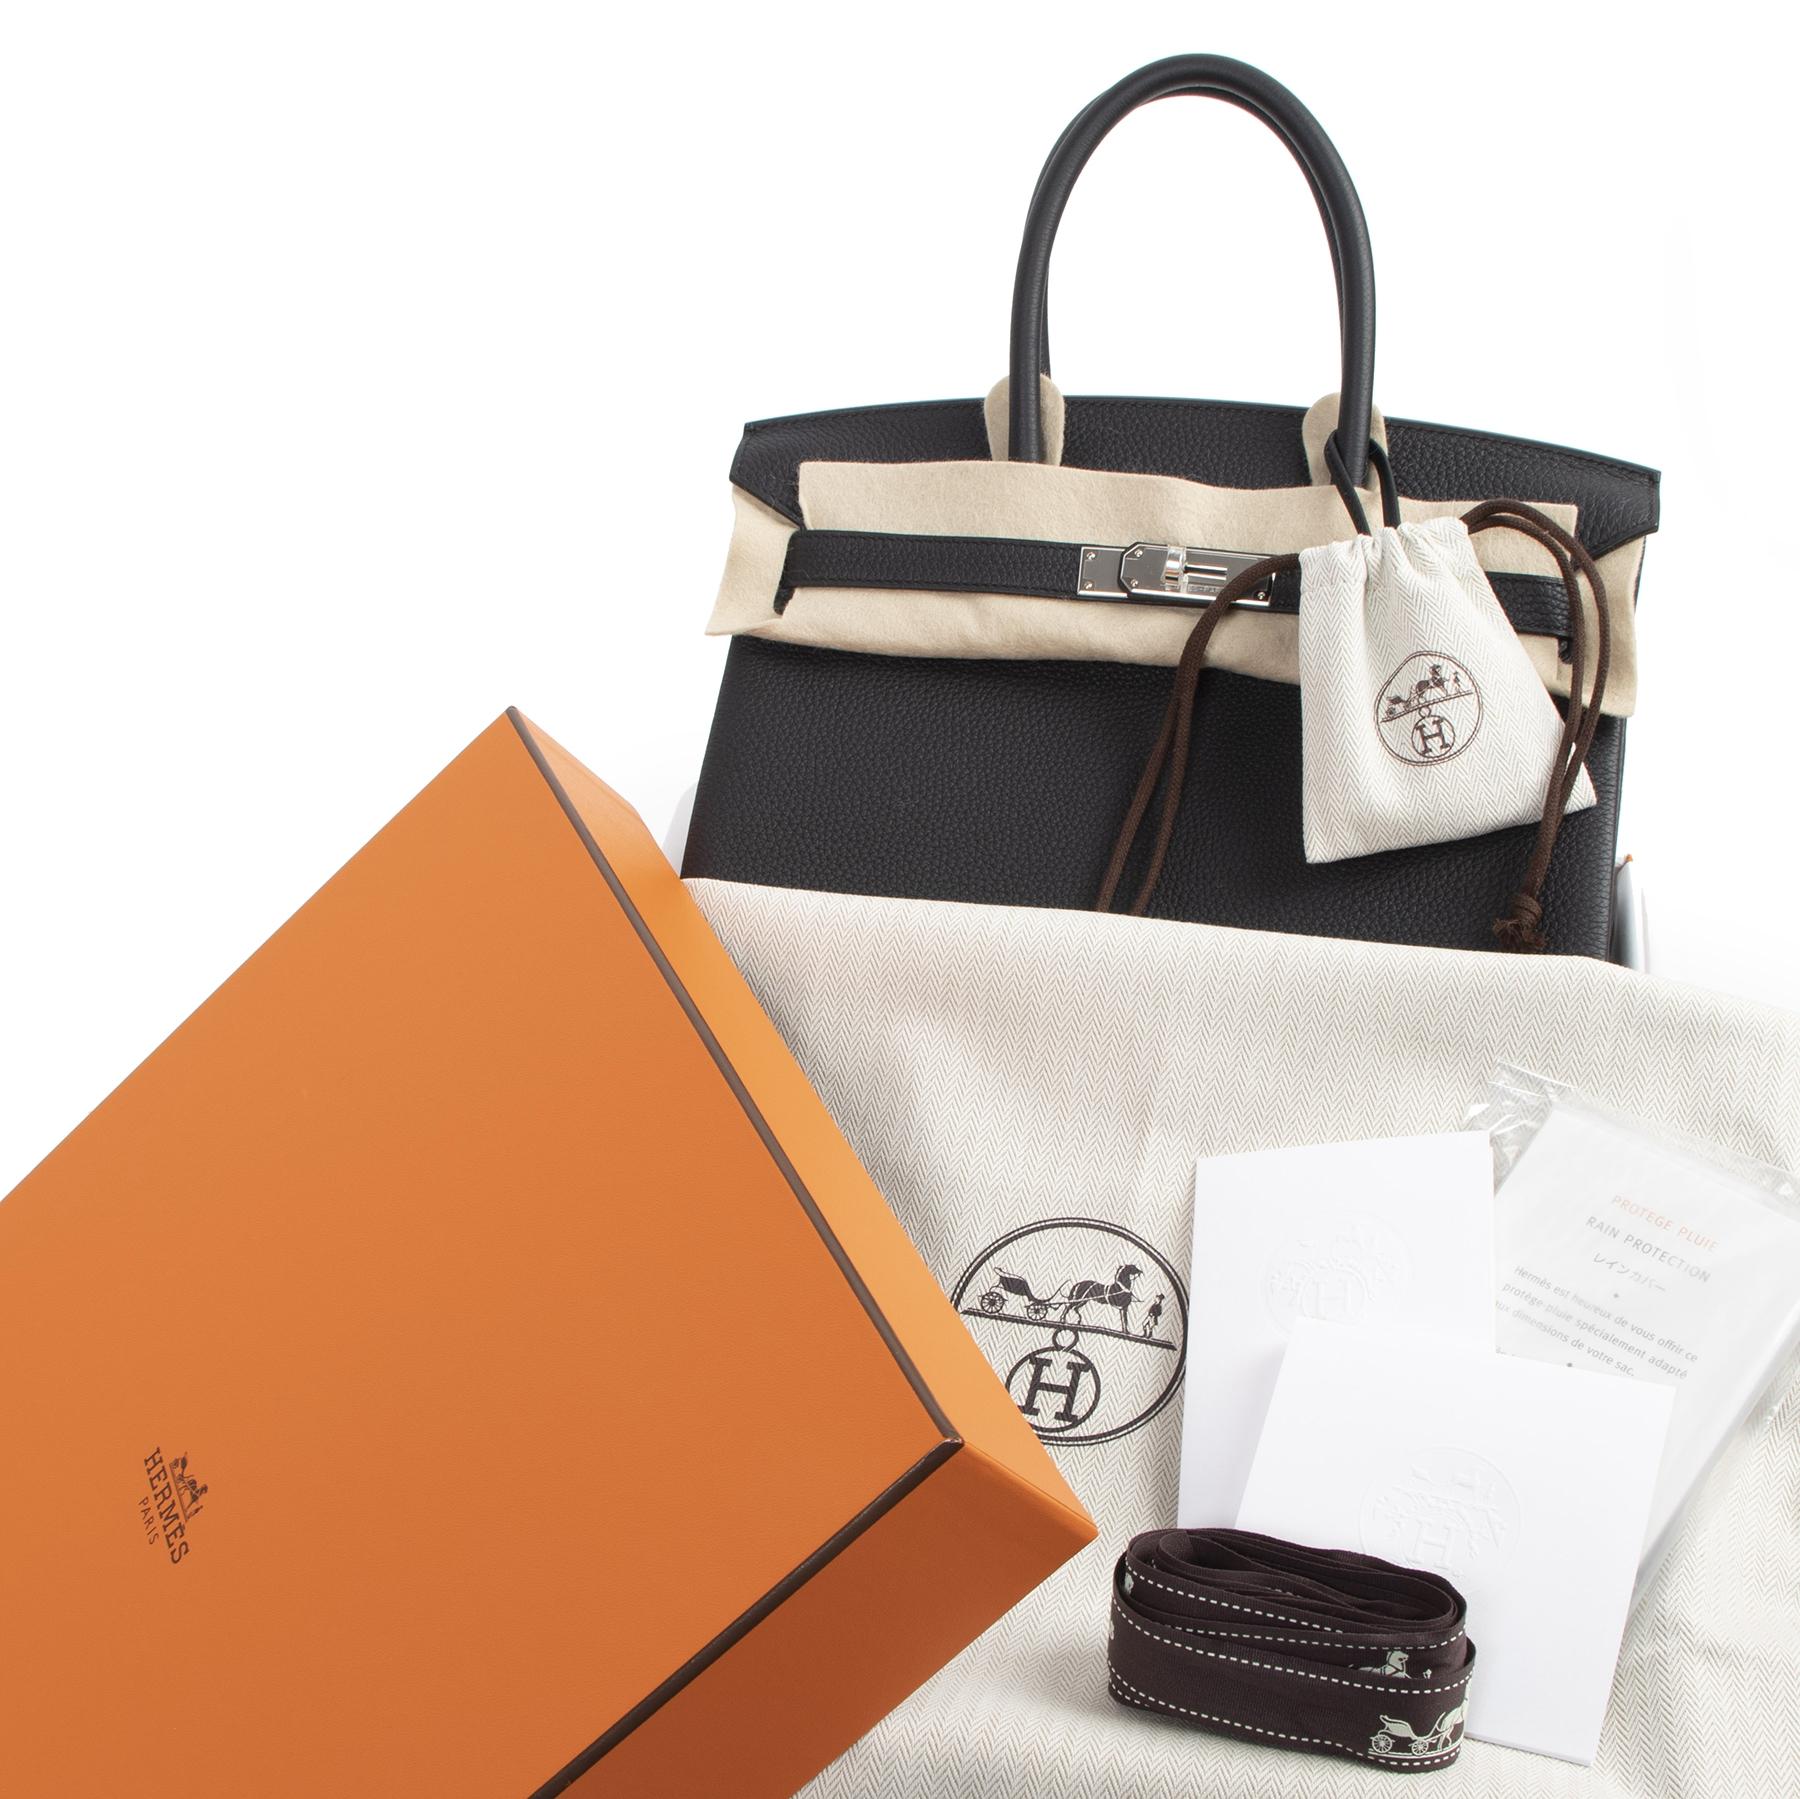 koop veilig online tweedehands Brand New Hermès Birkin 30 Black Togo PHW